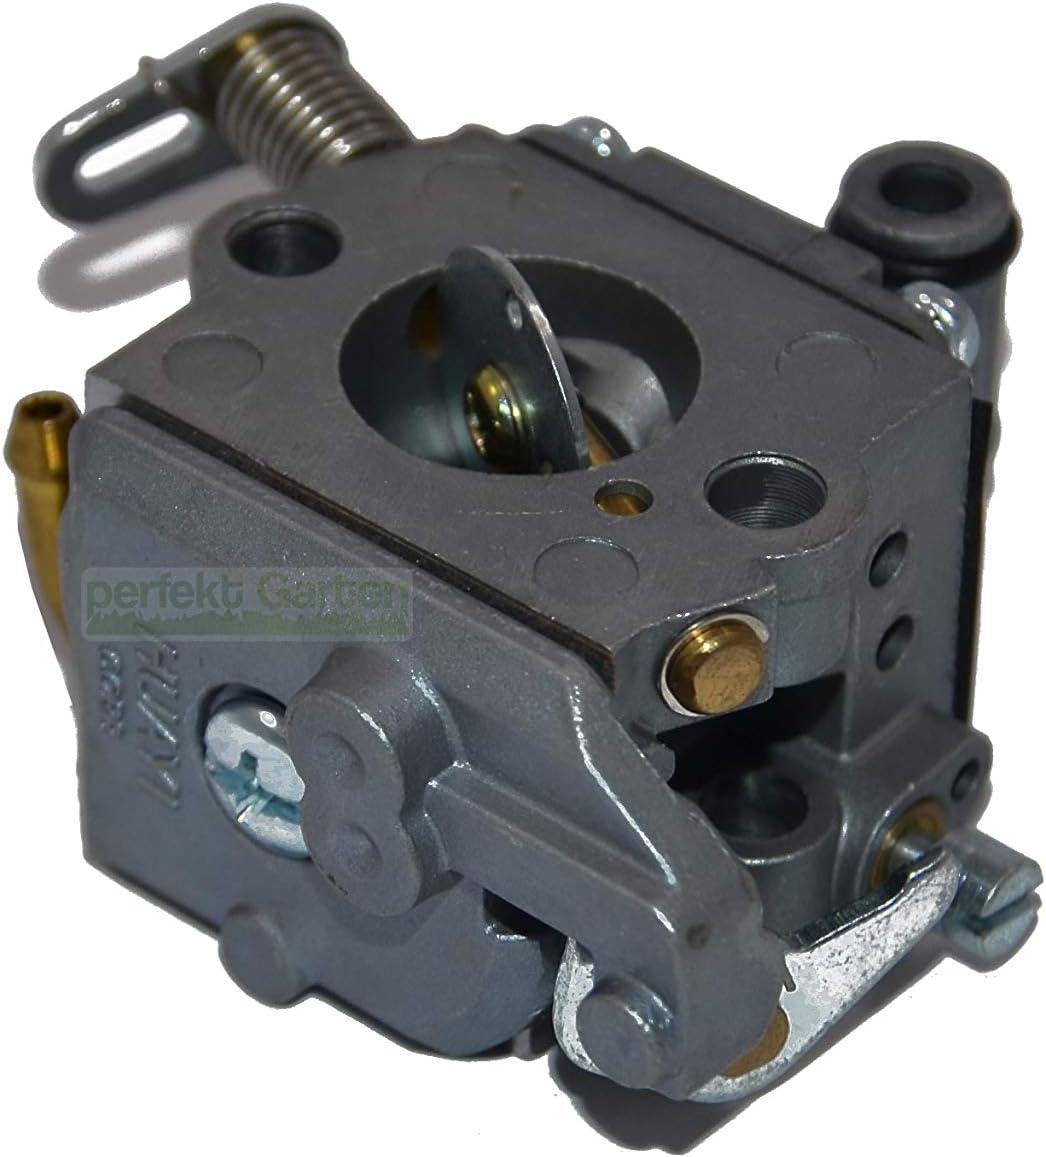 Carburador apto para motosierra still 017 MS 170 con compensador